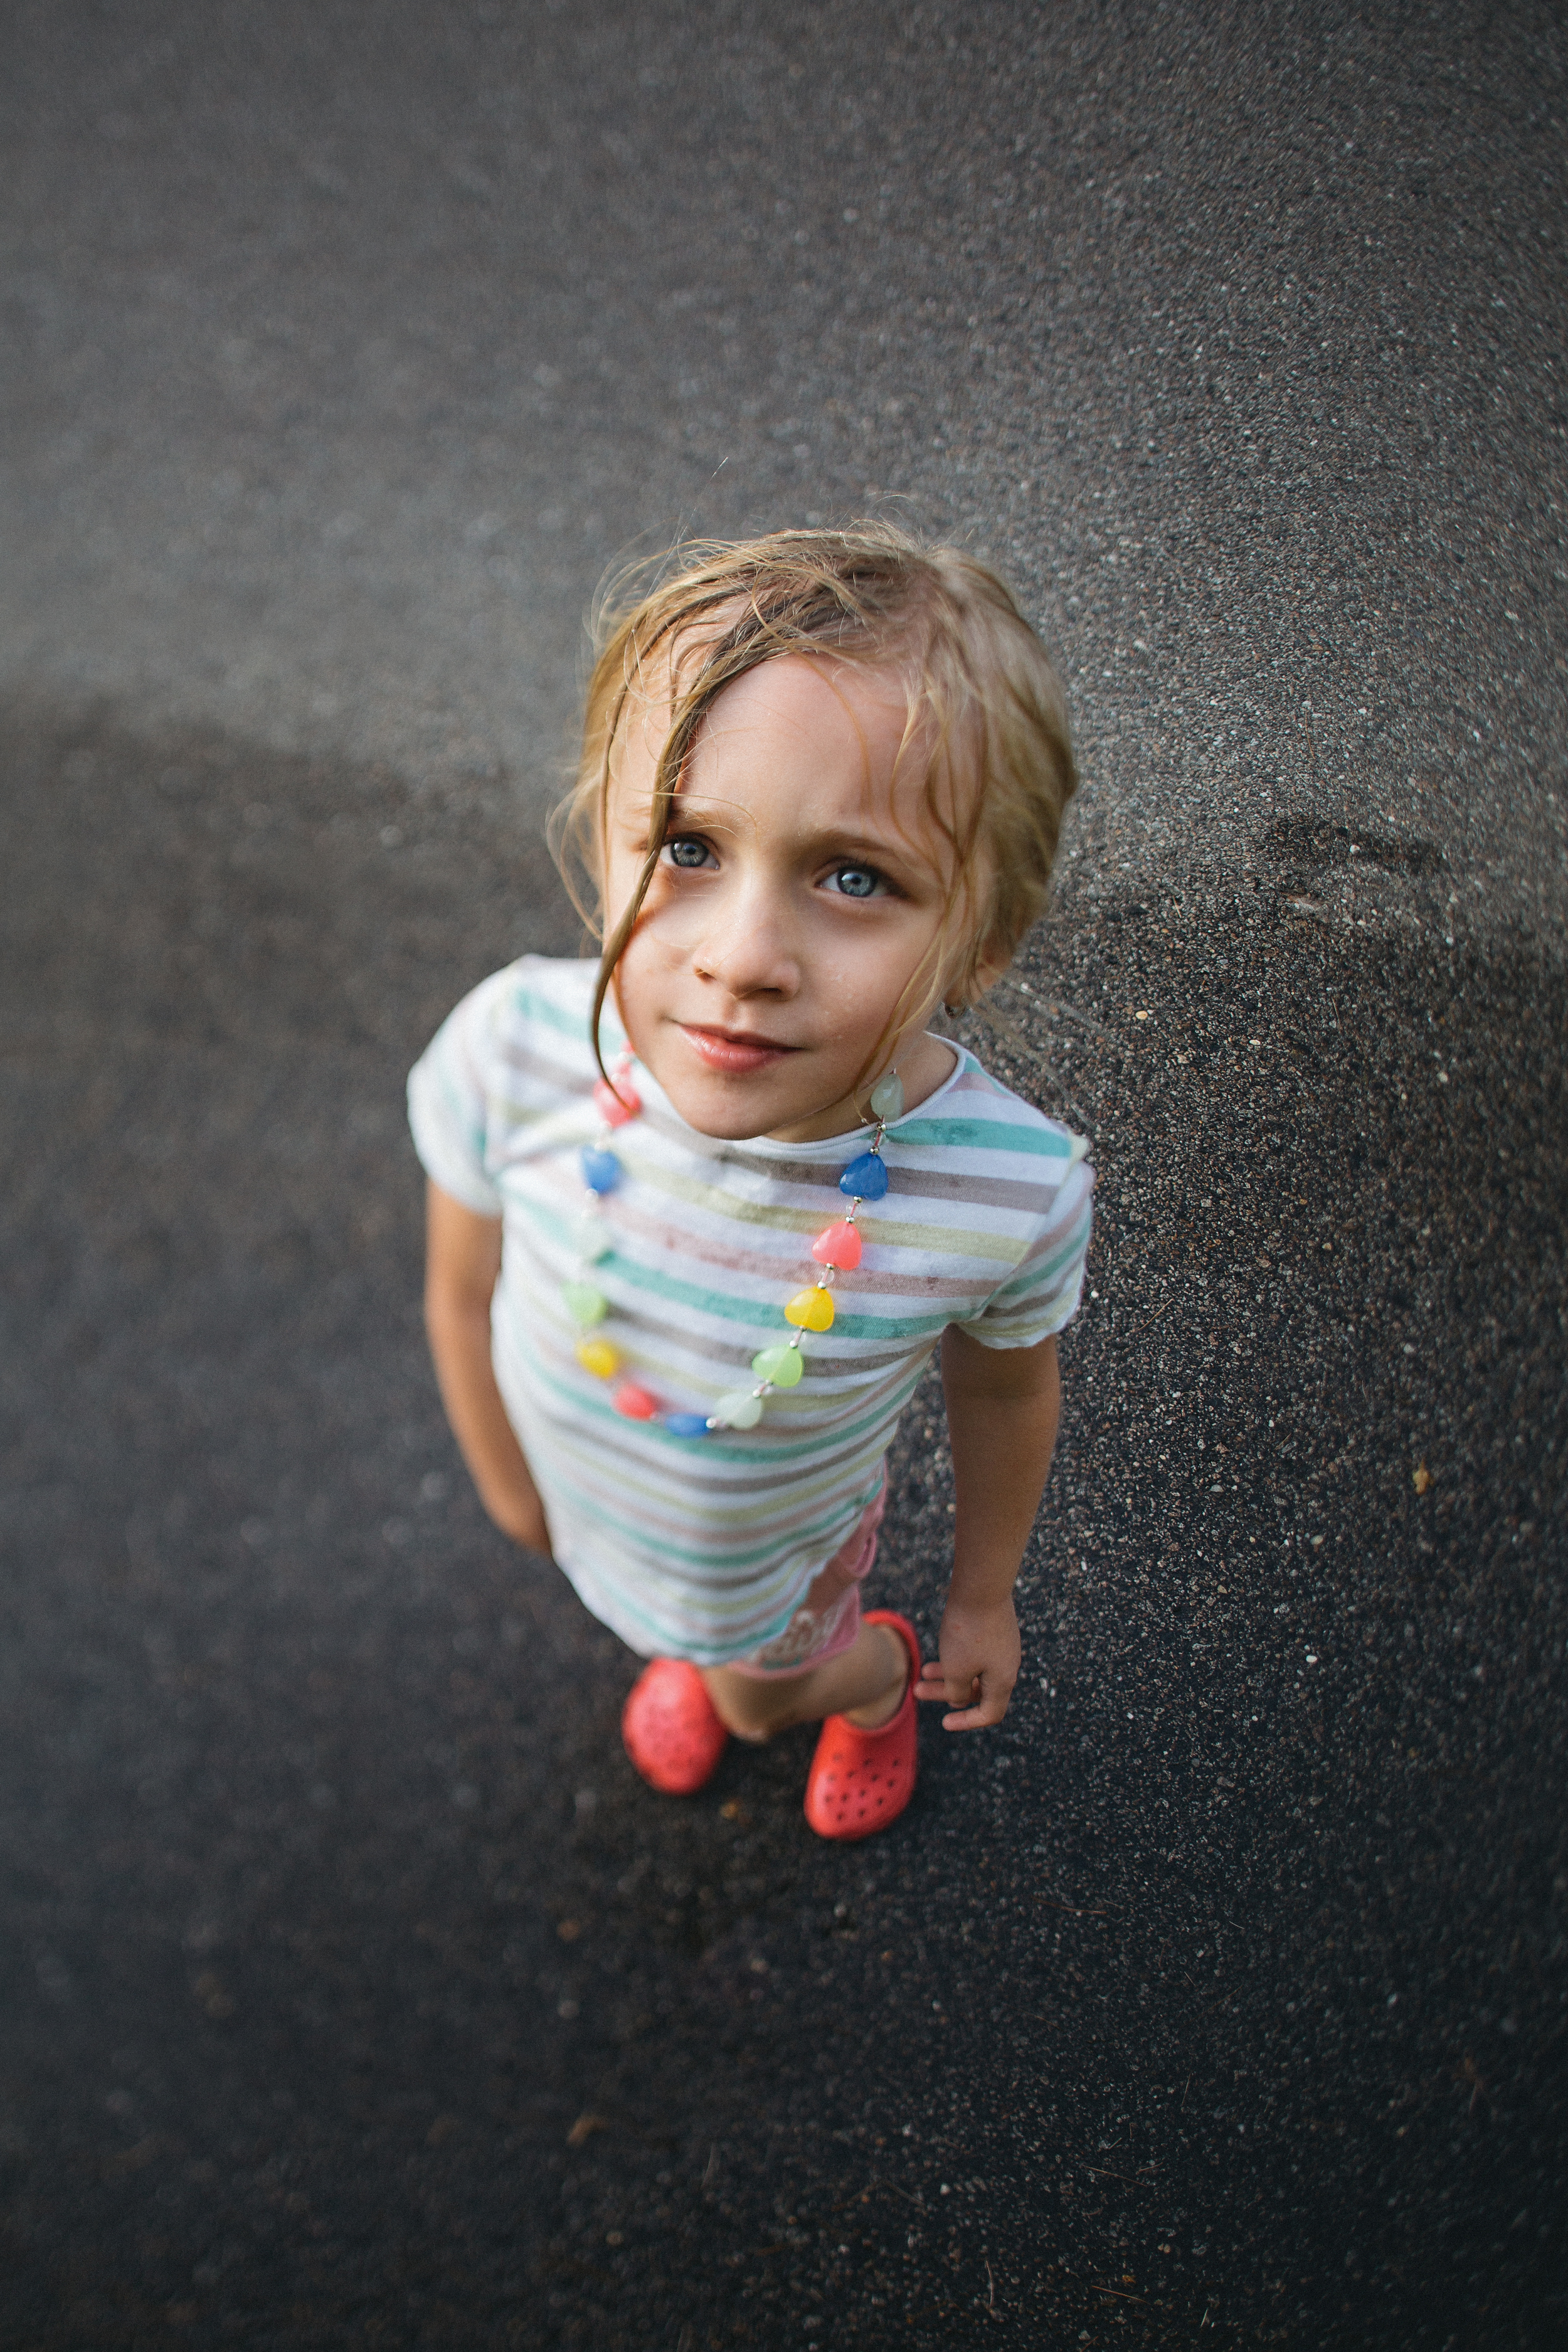 Long-island-photographer-hello-olivia-photography-family-child-dress-suffolk-sprinkler-lifestyle.jpg